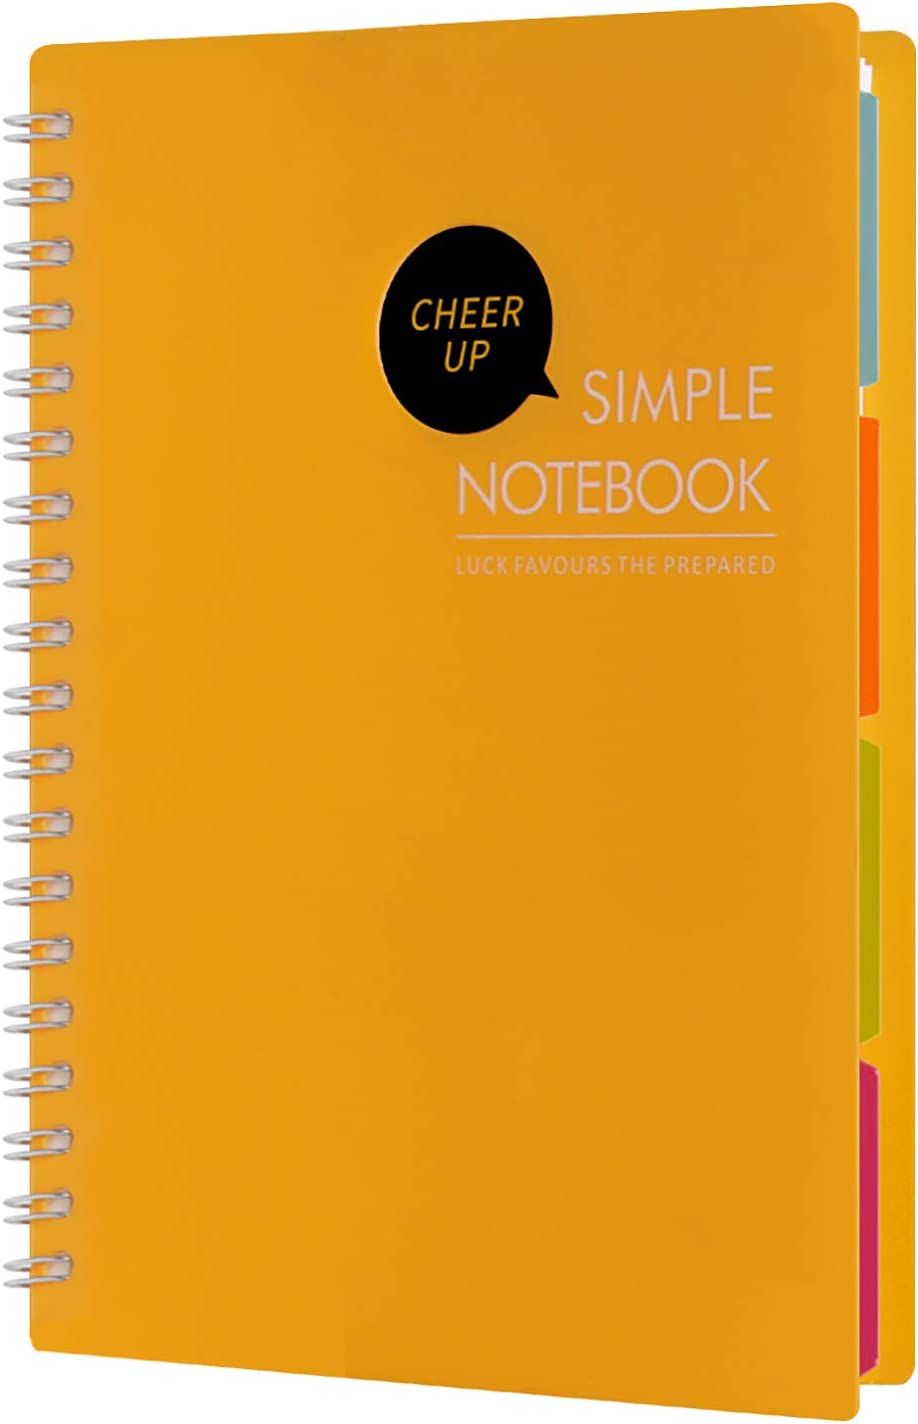 Cheerup Spiral Notebook B5 10